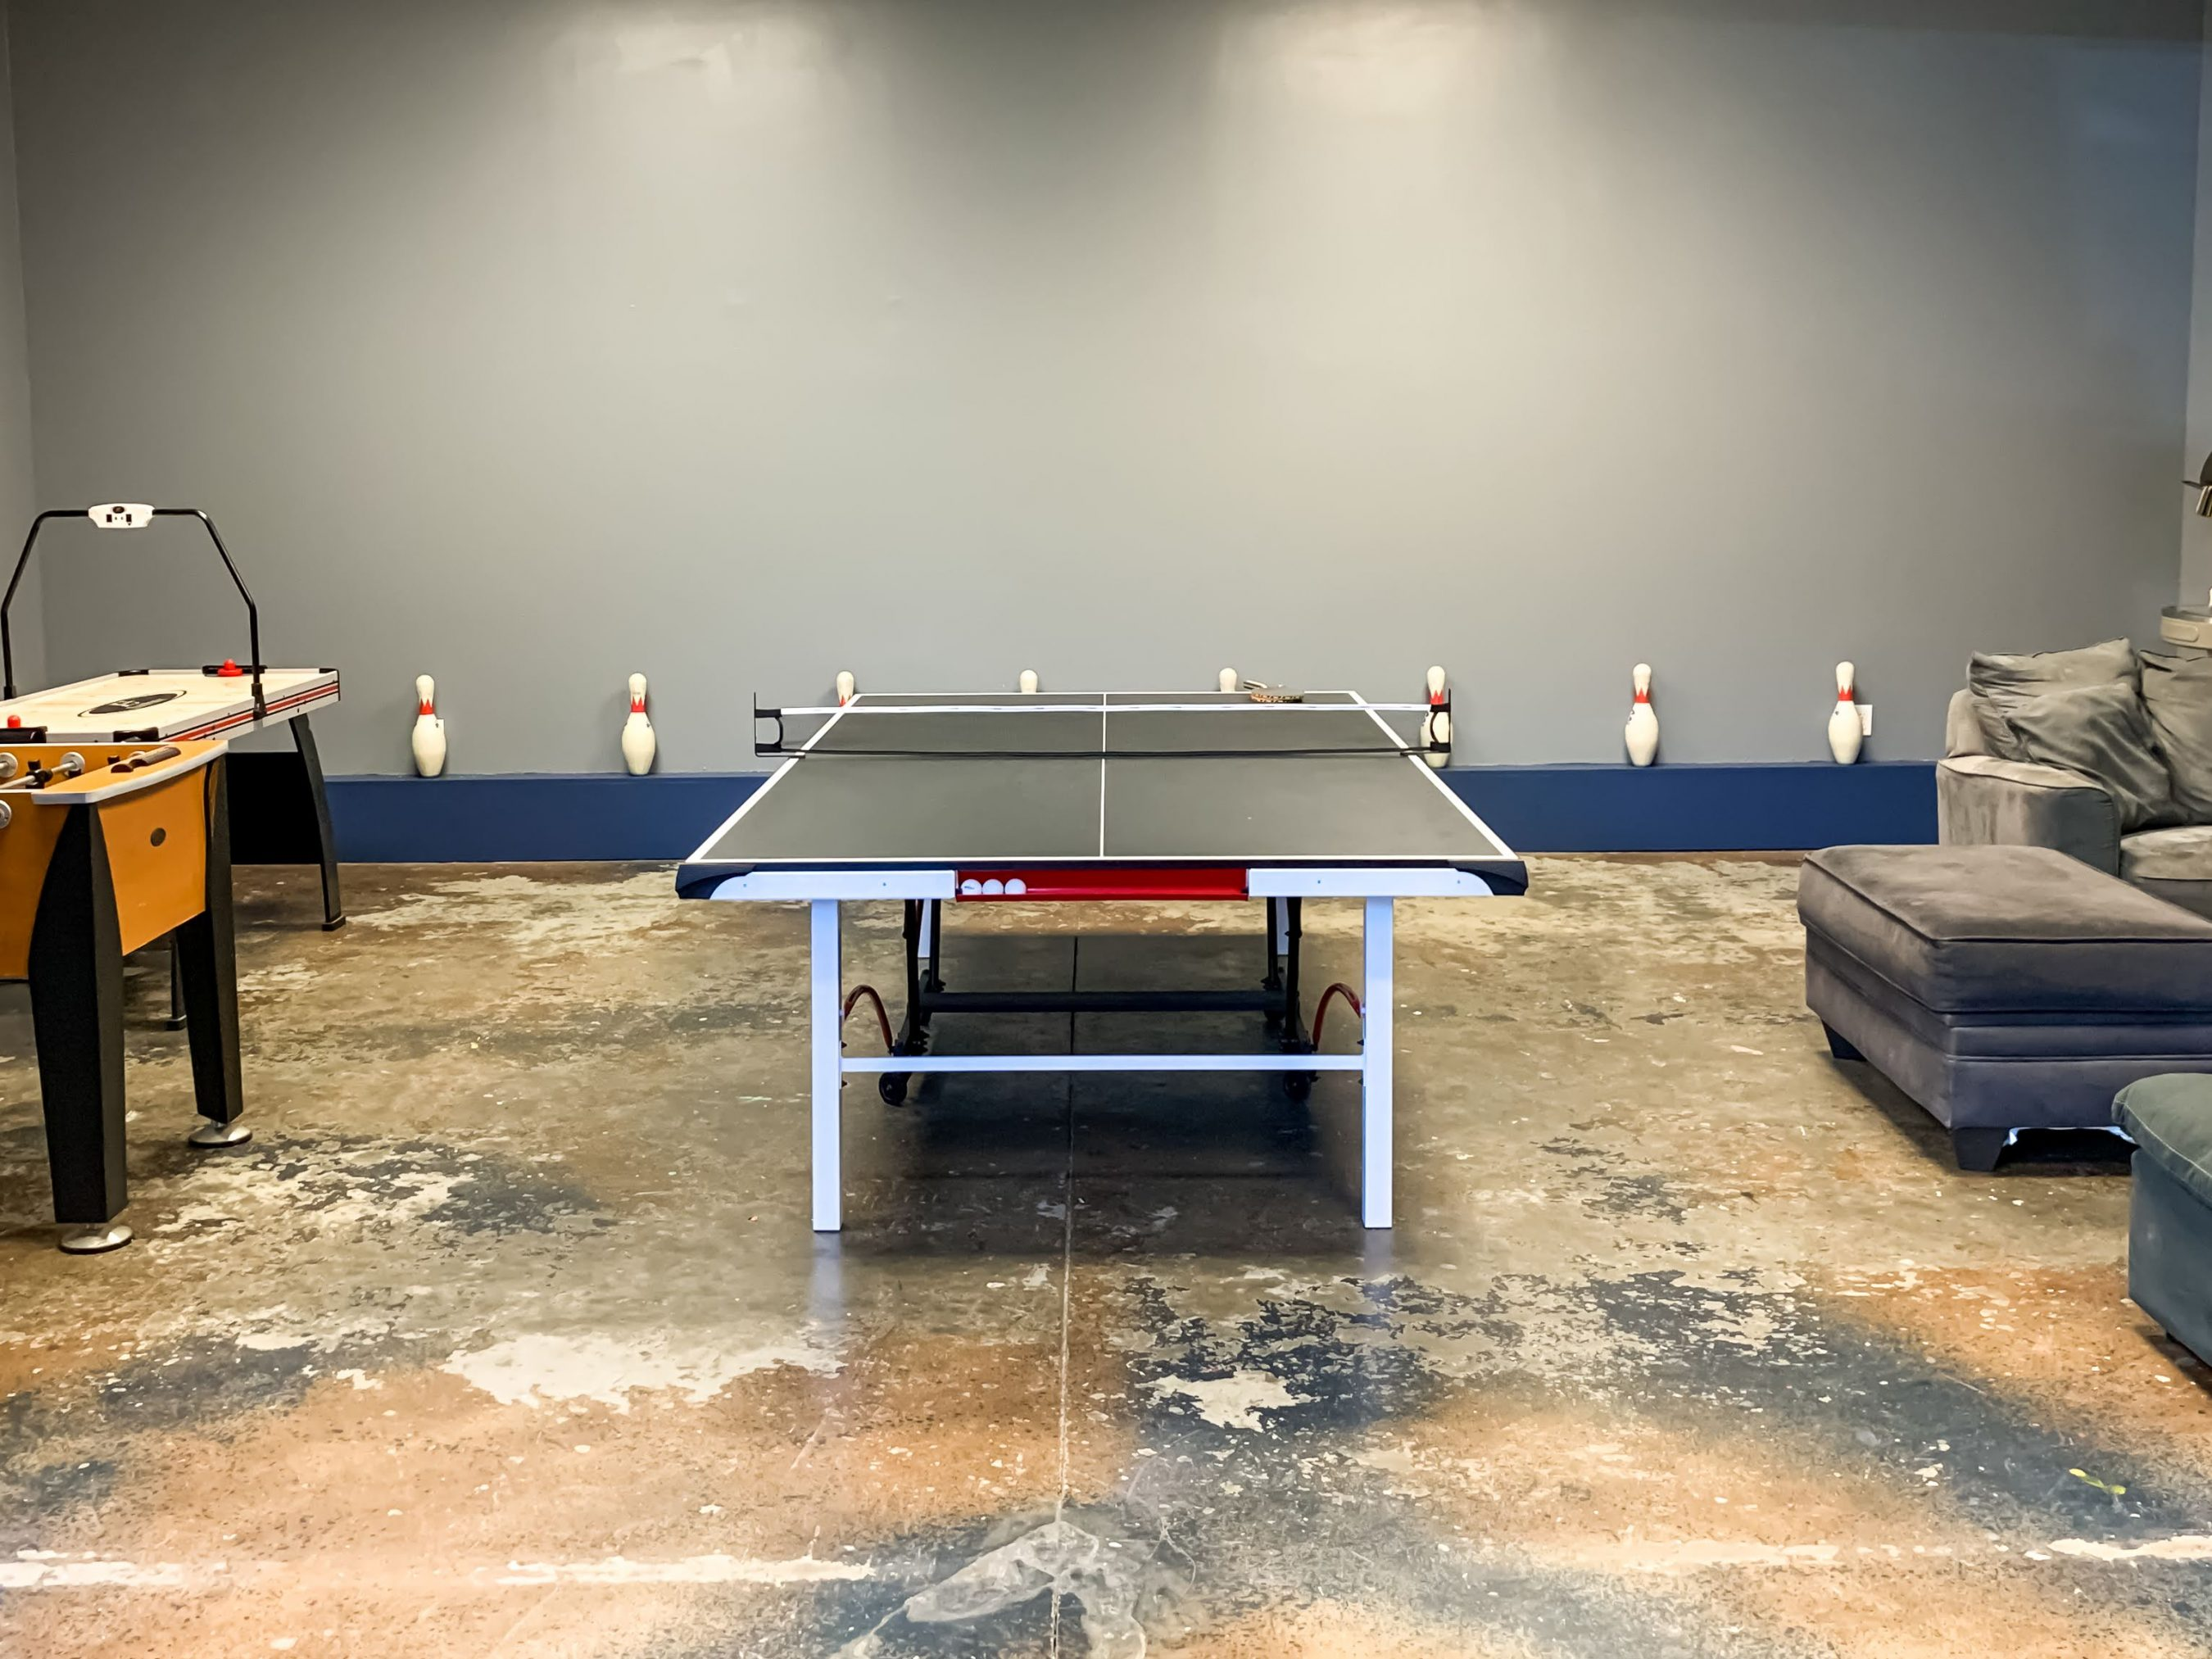 YC Game room